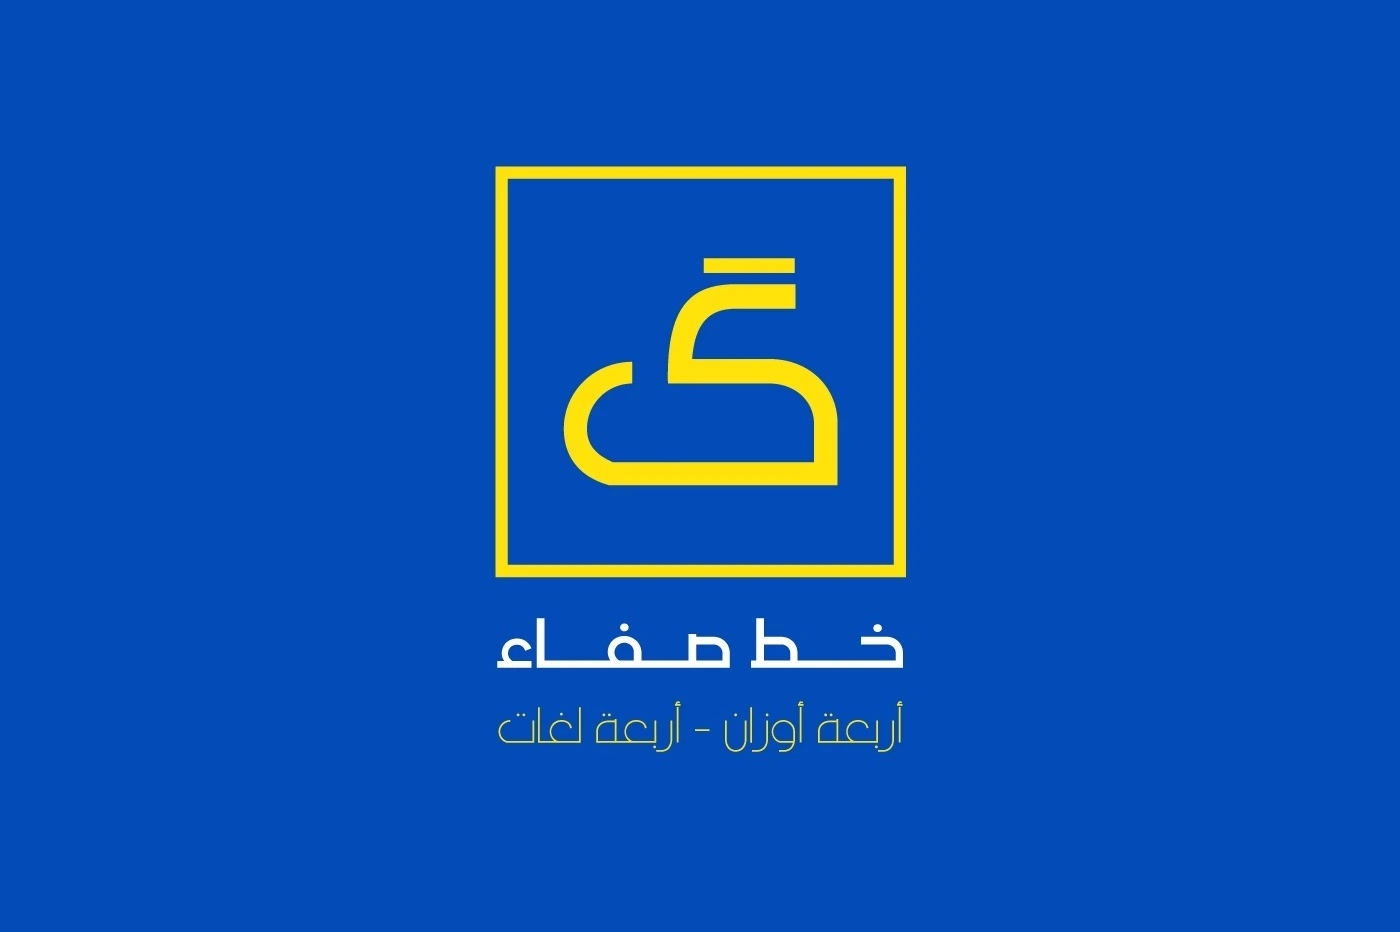 2020 fonts  2021 fonts  arabic font  arabic typeface  free  free font  freebies  latin fonts  خط مجاني  خطوط عربية  خطوط مجانية